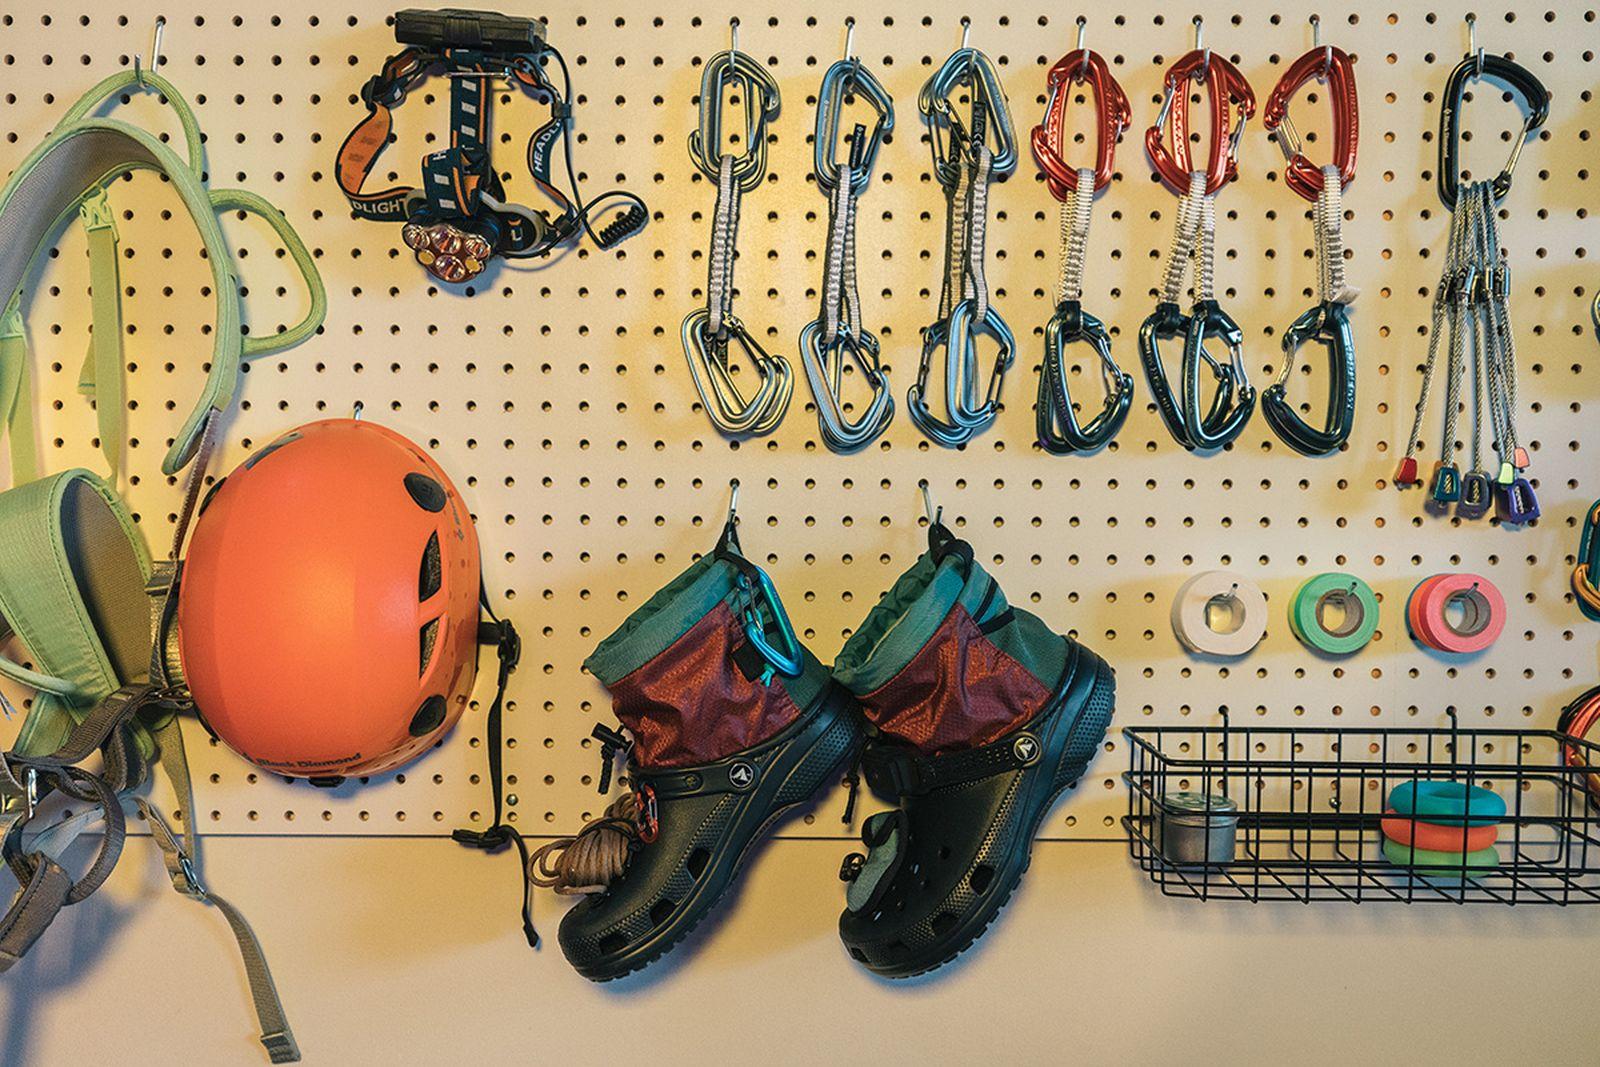 Nicole McLaughlin x Crocs Classic Clog